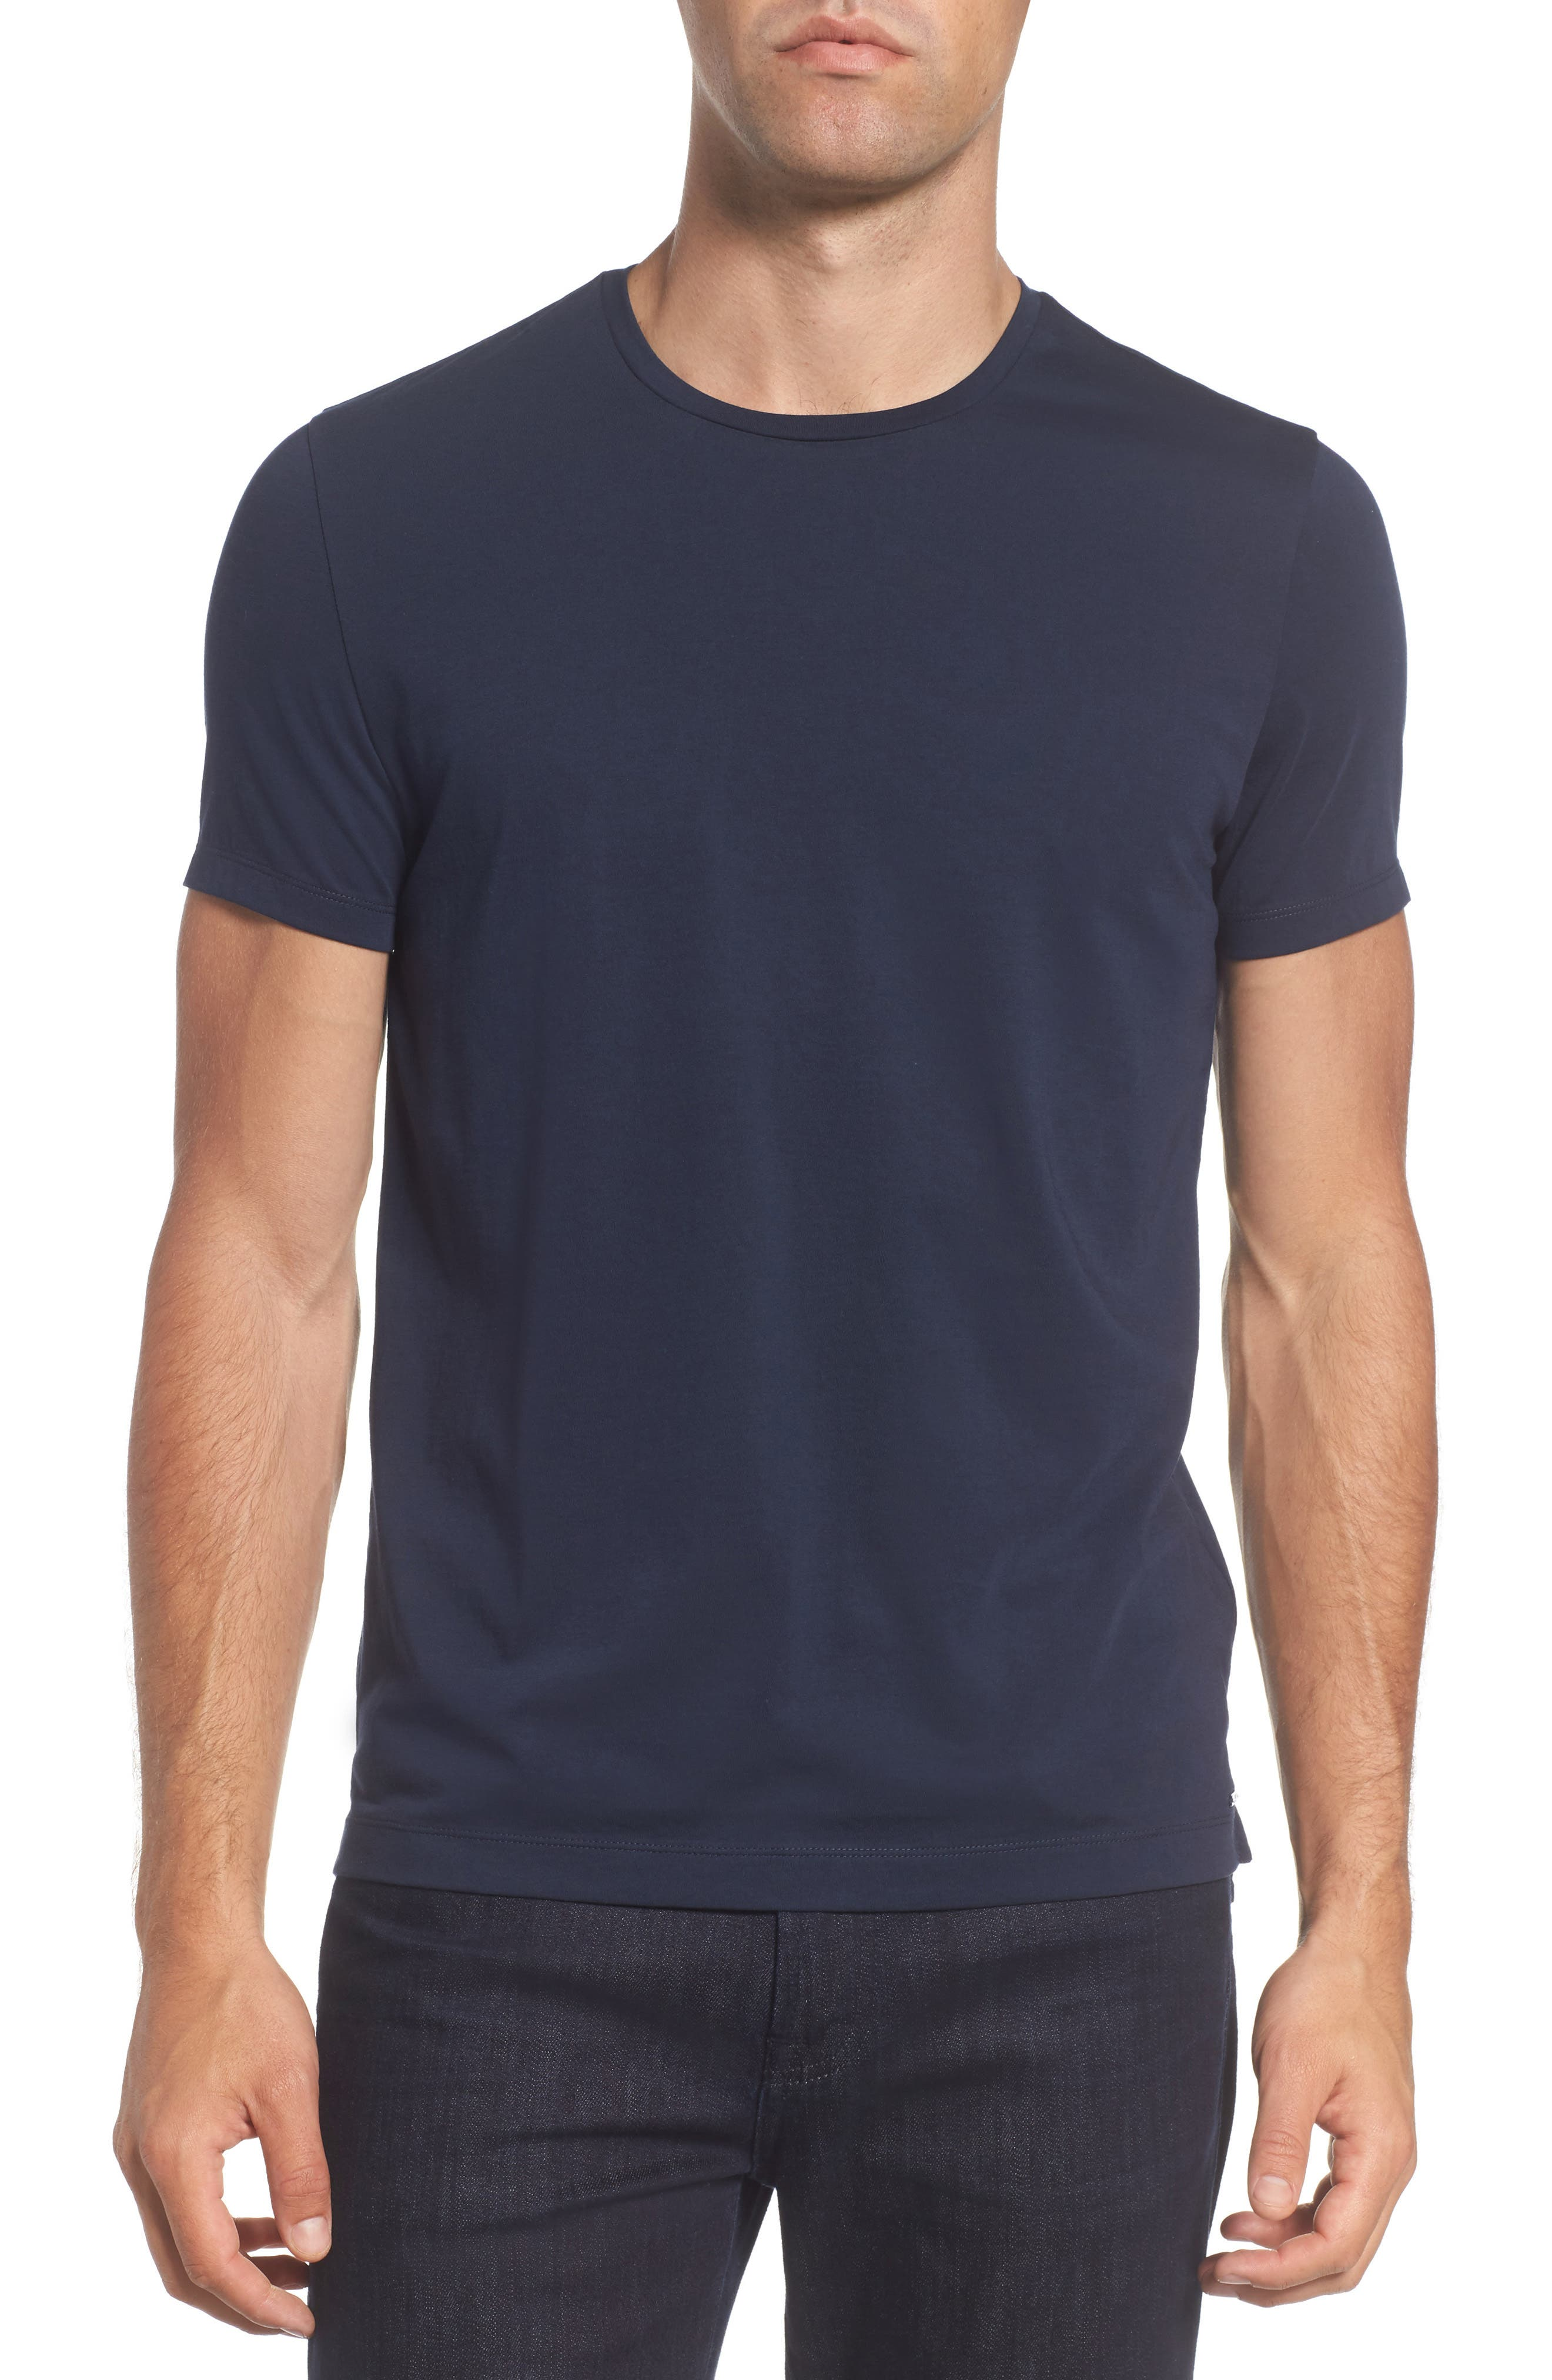 Tessler Crewneck T-Shirt,                         Main,                         color, Black